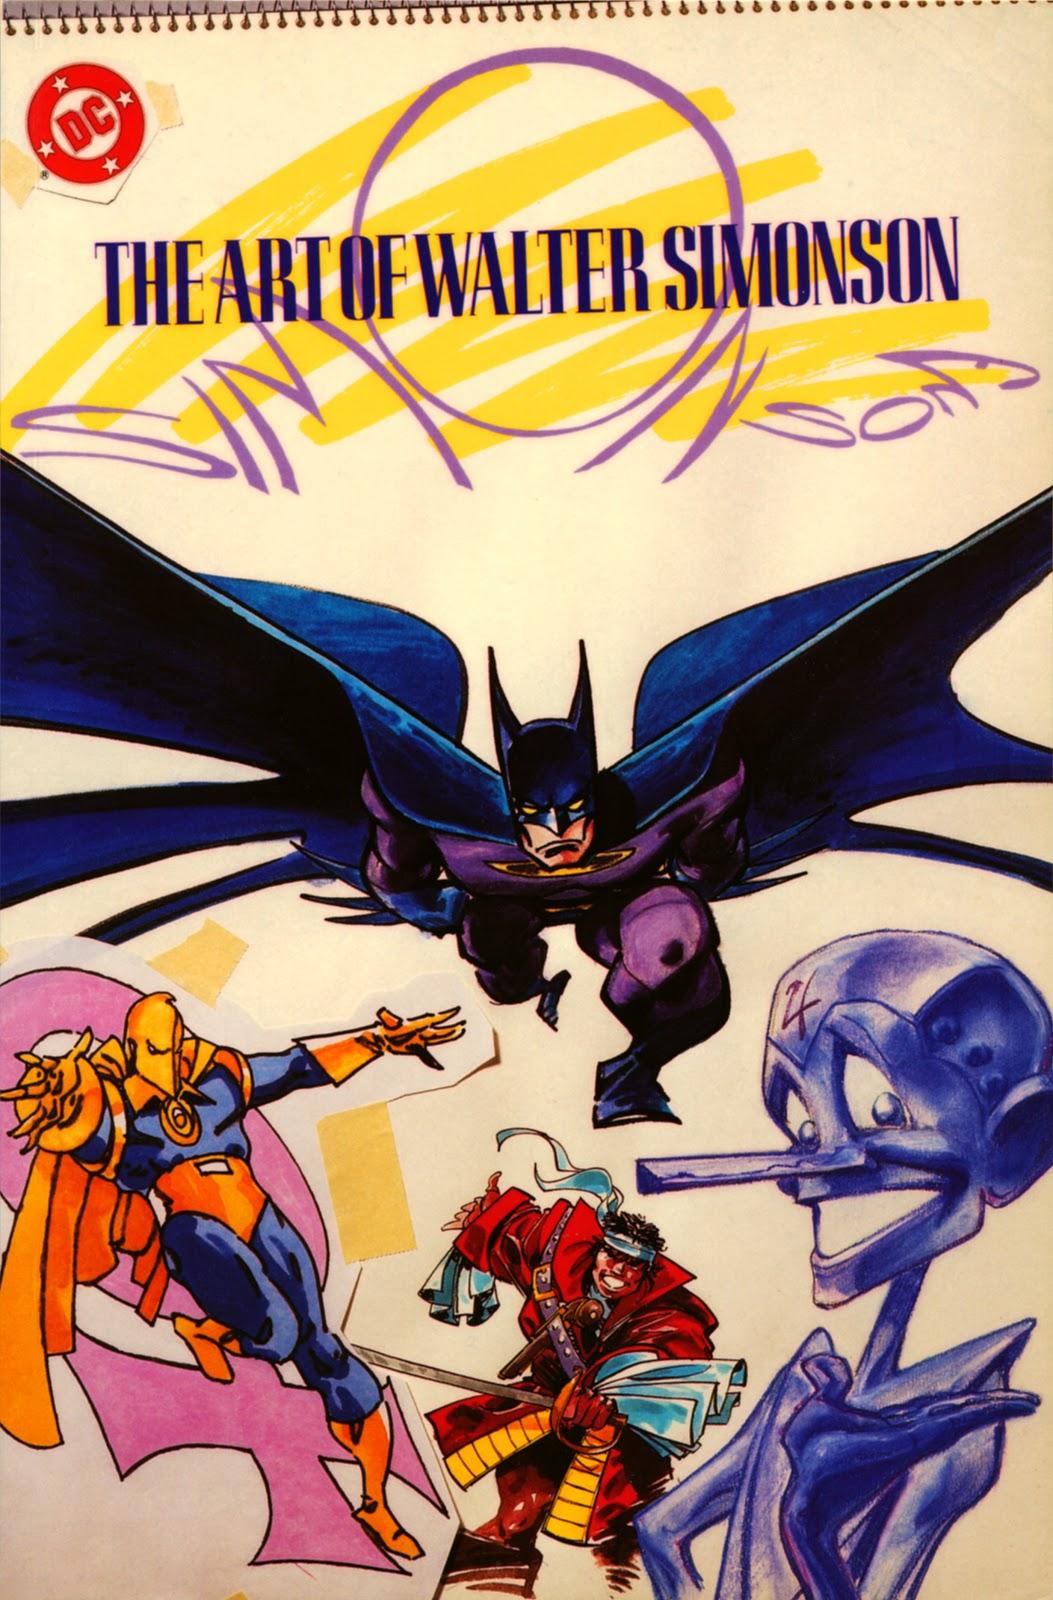 Read online The Art of Walter Simonson comic -  Issue # TPB - 1